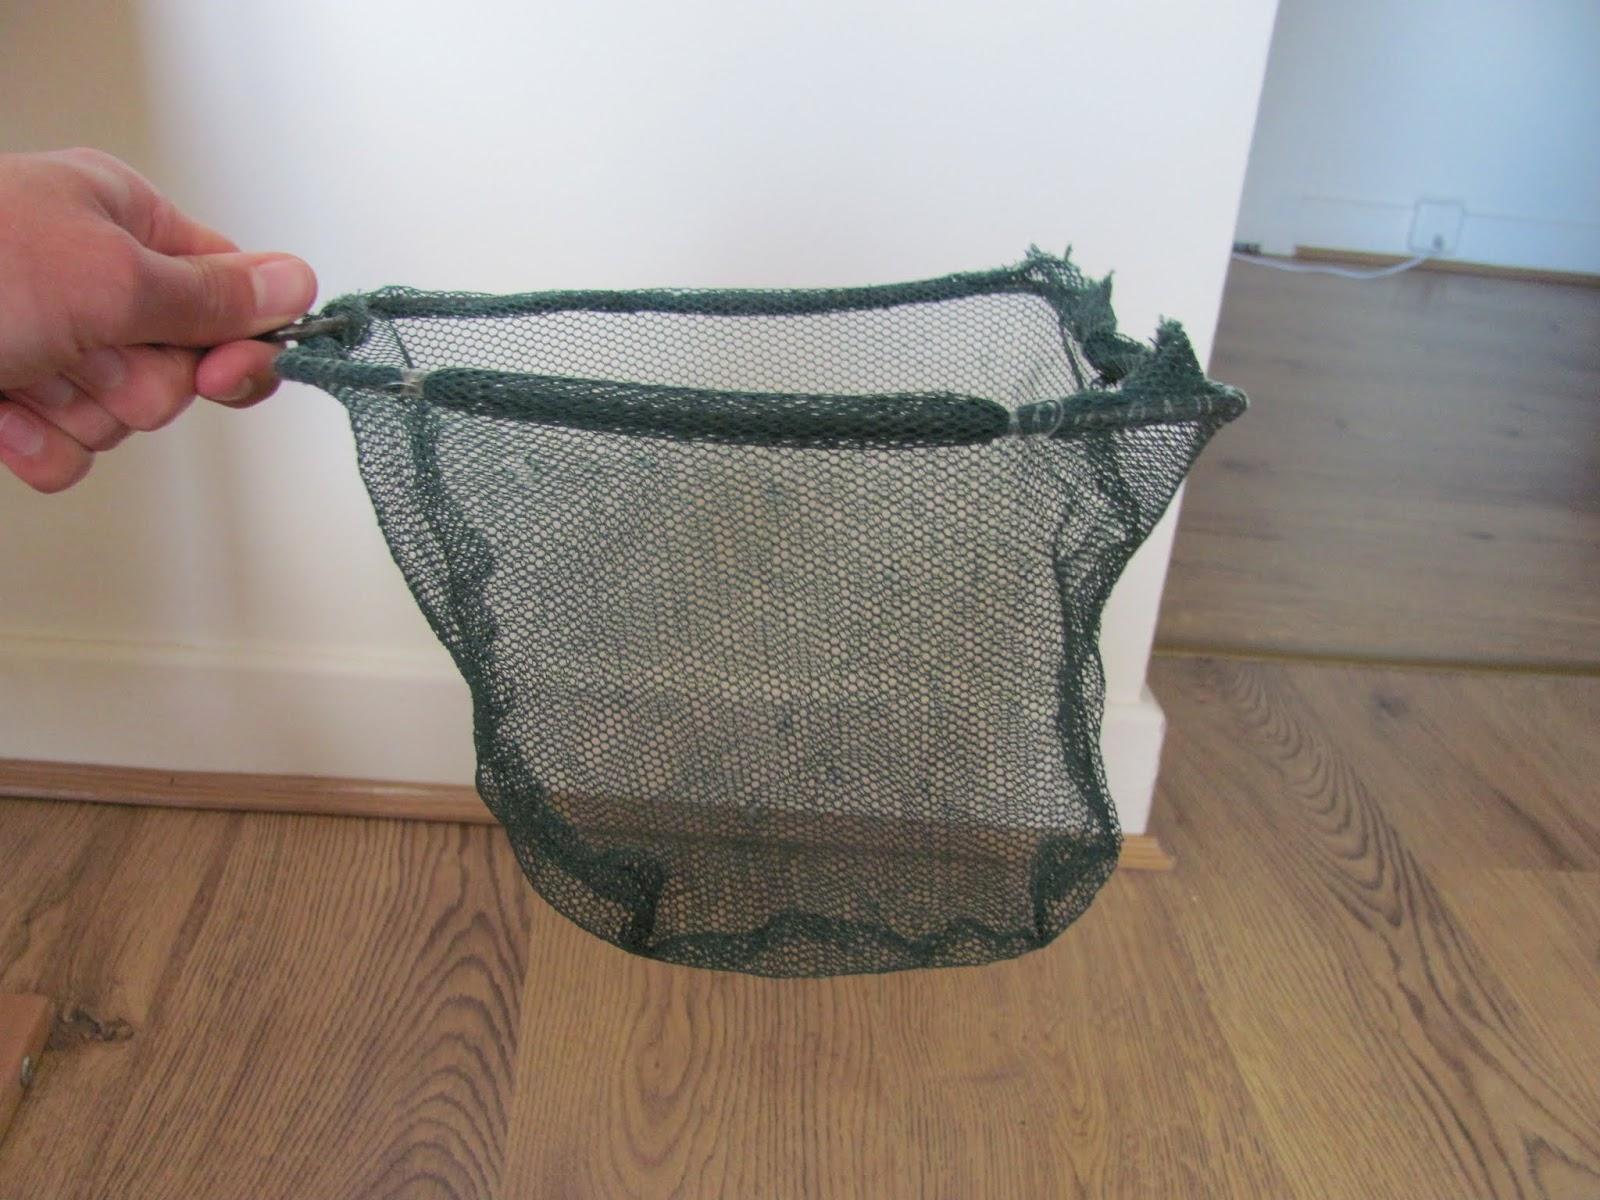 A green landing net pictured in Dublin, Ireland